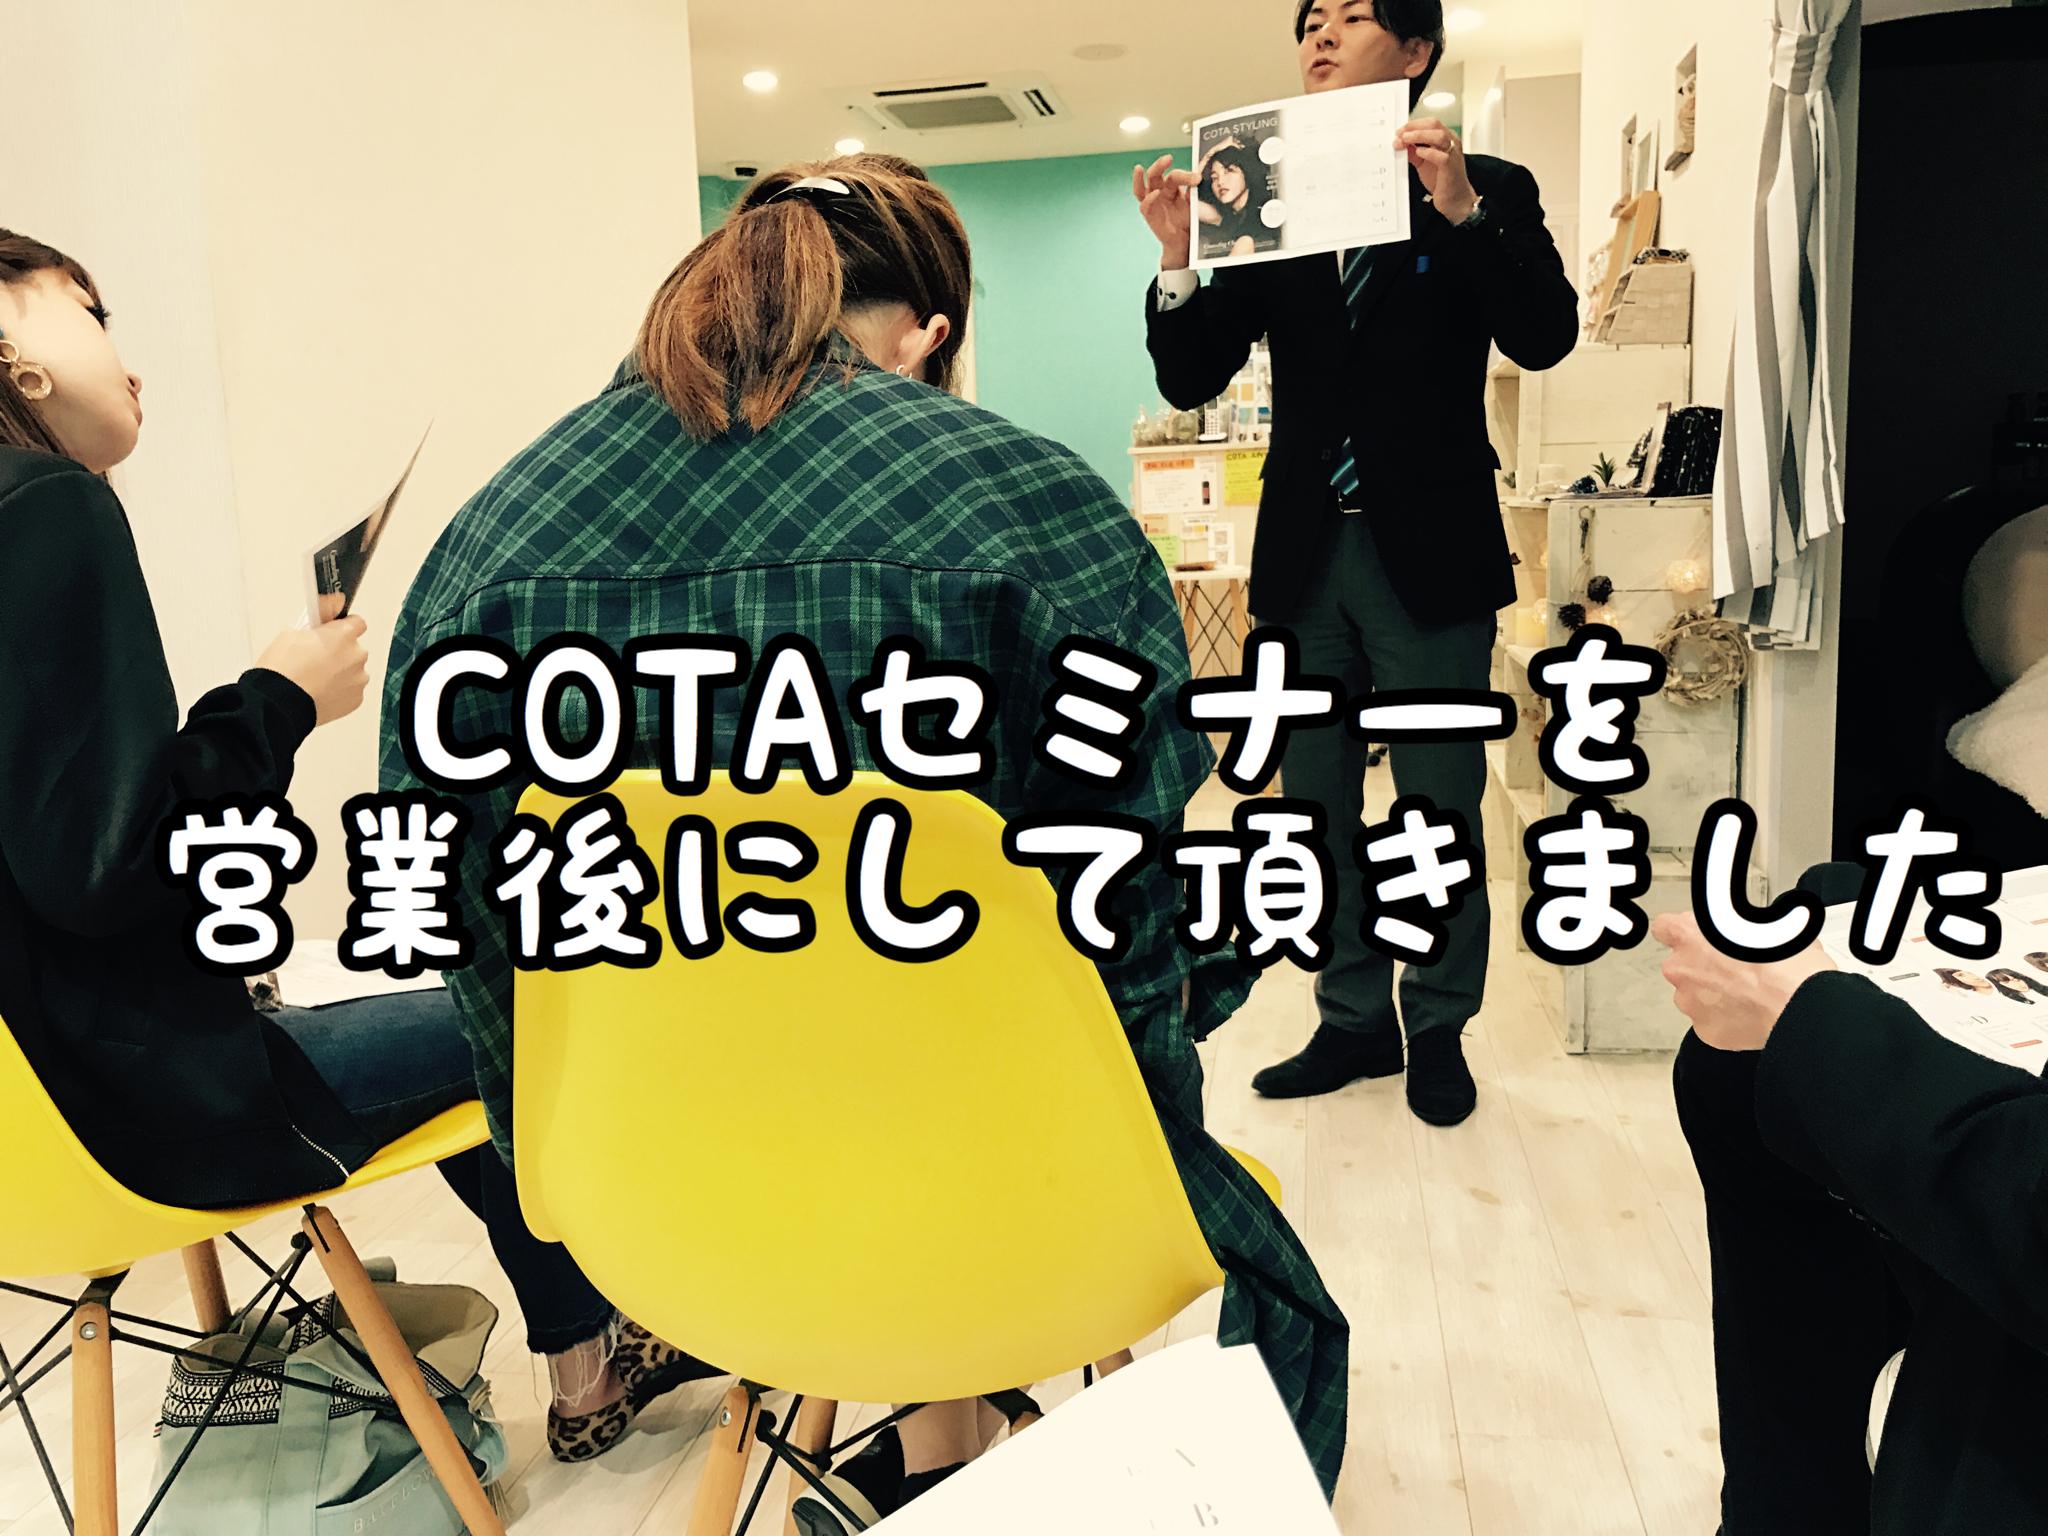 【COTA】私たちは定期的に繰り返し自社取扱製品の勉強をしています